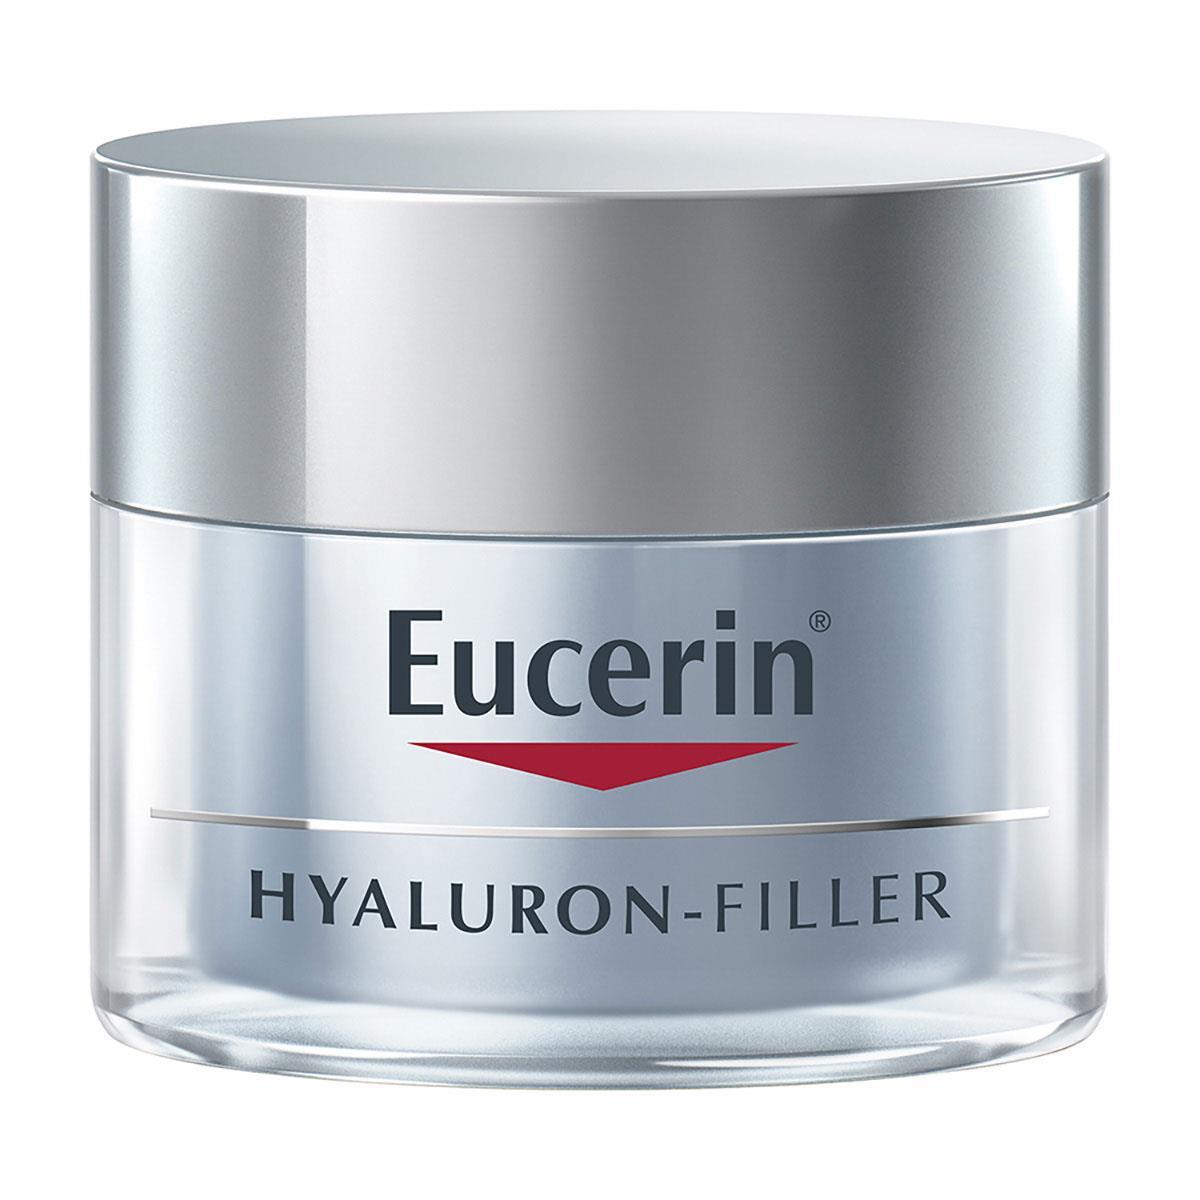 Eucerin Hyalur Fill Noche 1 Tarro Tarro 50 Ml